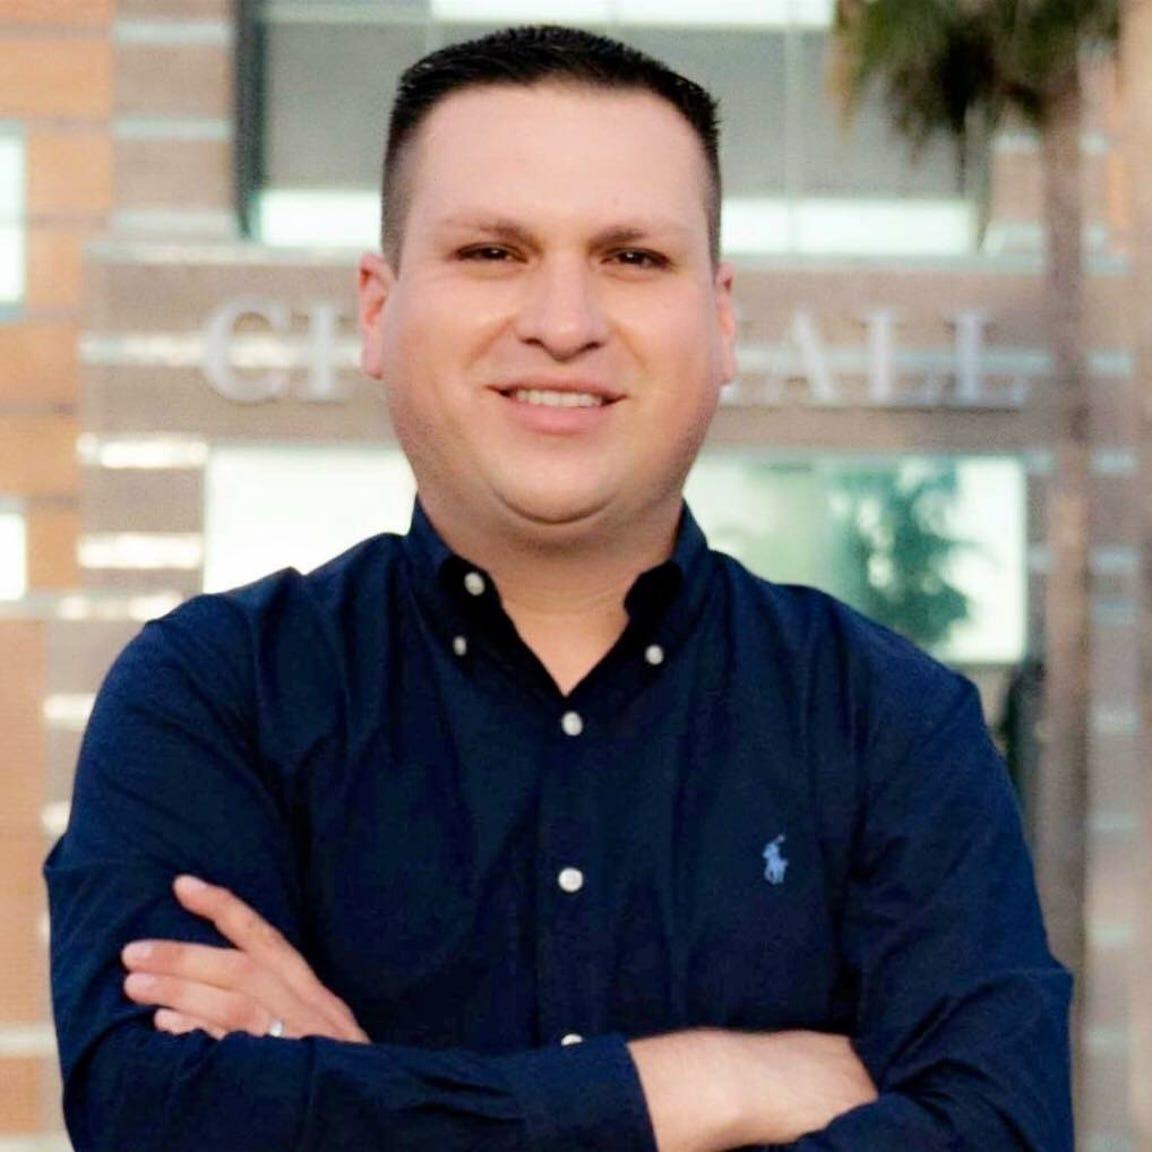 Corpus Christi City Council District 3 candidate Eric Cantu